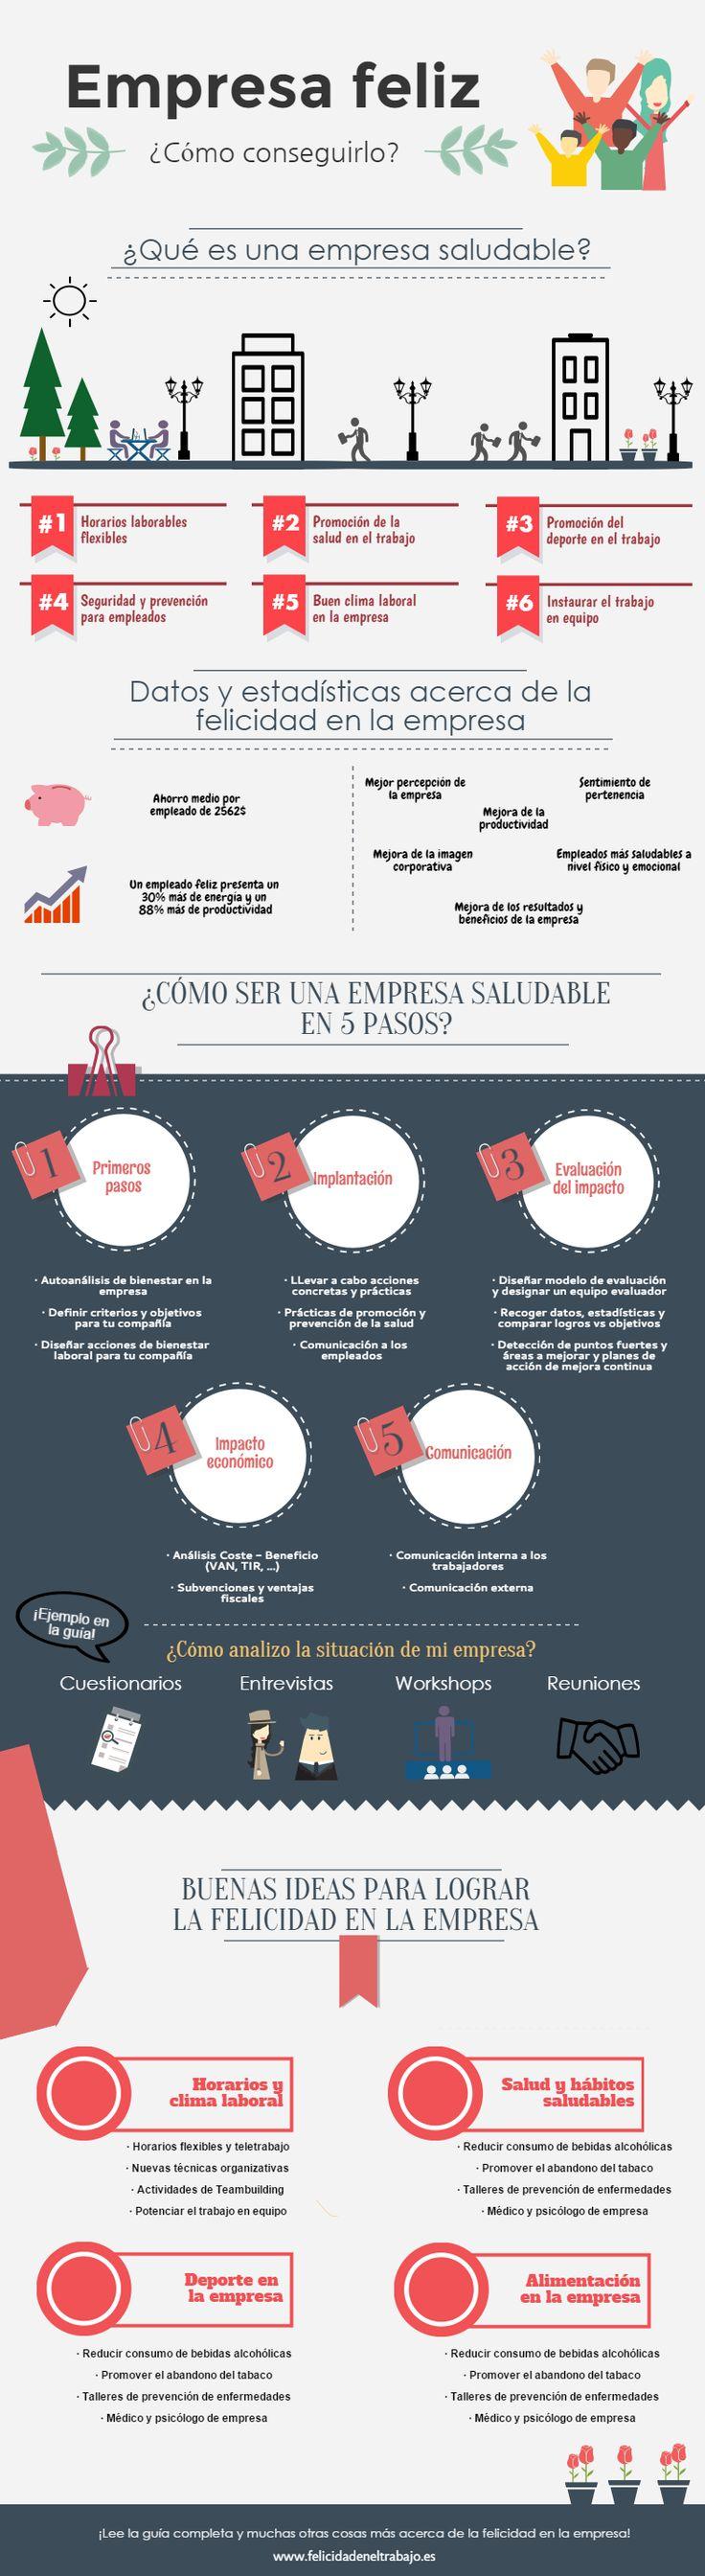 Empresa Feliz: guía para conseguir que tu empresa lo sea #infografia #infographic #rrhh